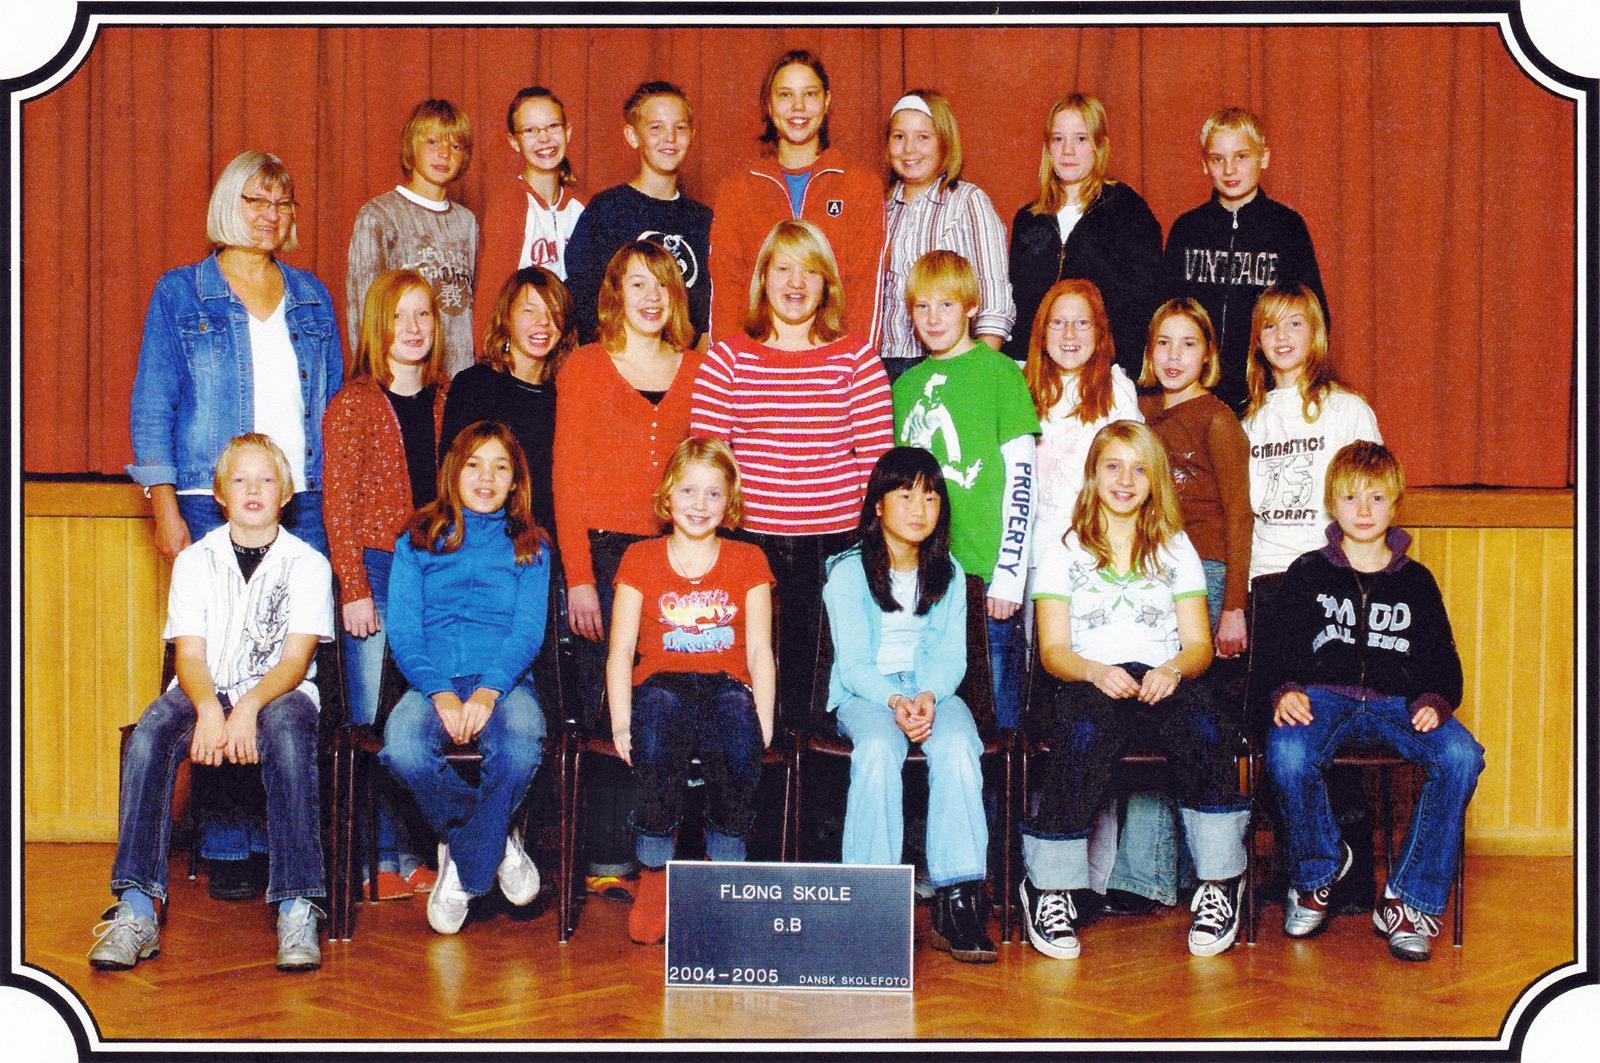 IMG_6.B 2004-05